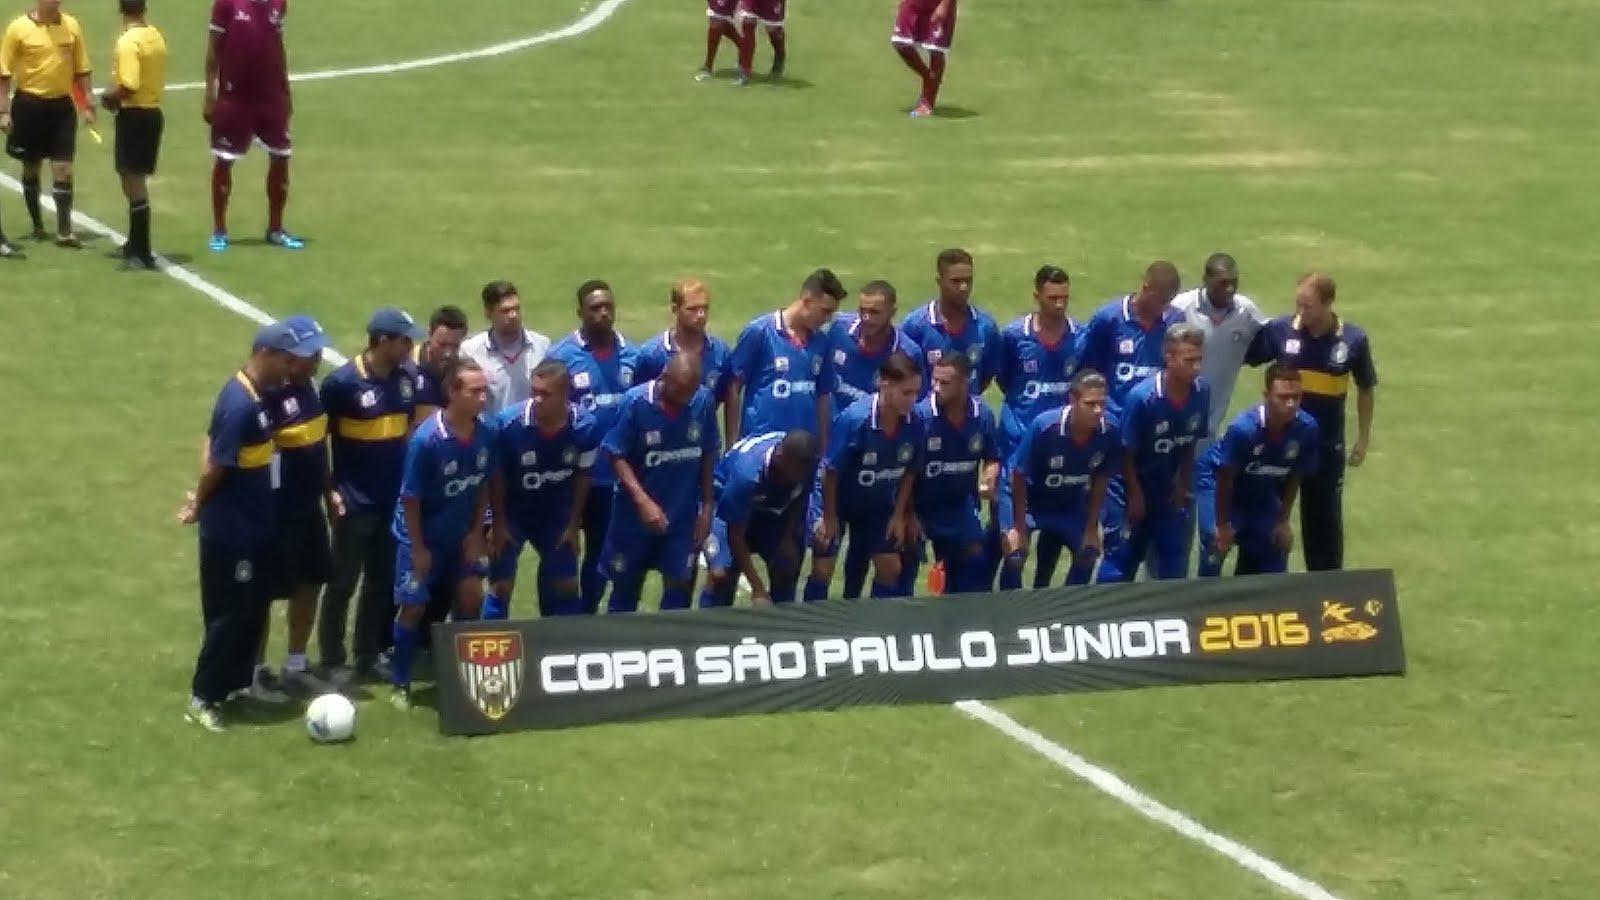 COPA SÃO PAULO JUNIOR 2016